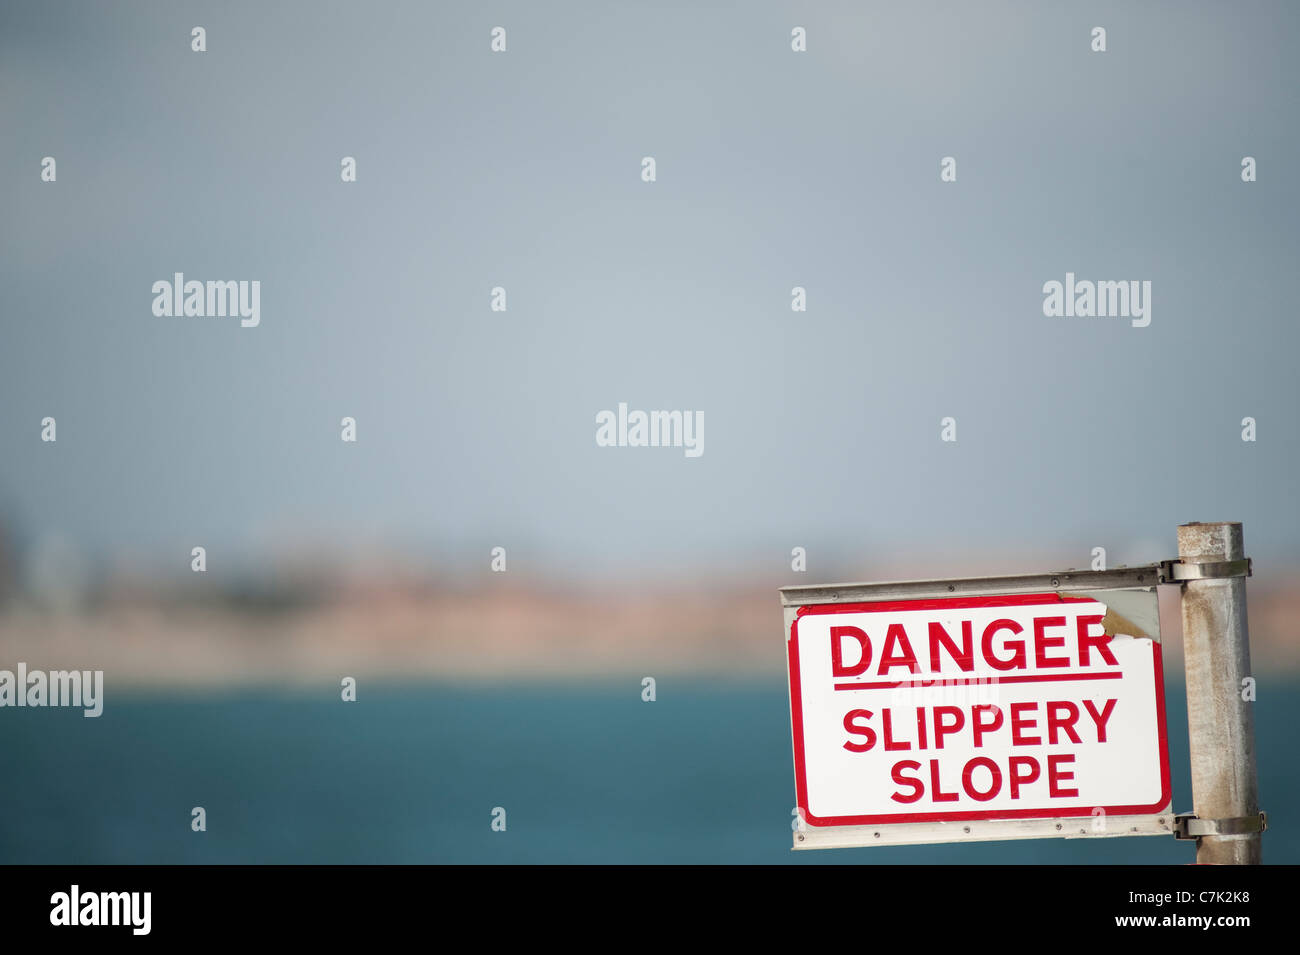 Slippery Slope - Stock Image